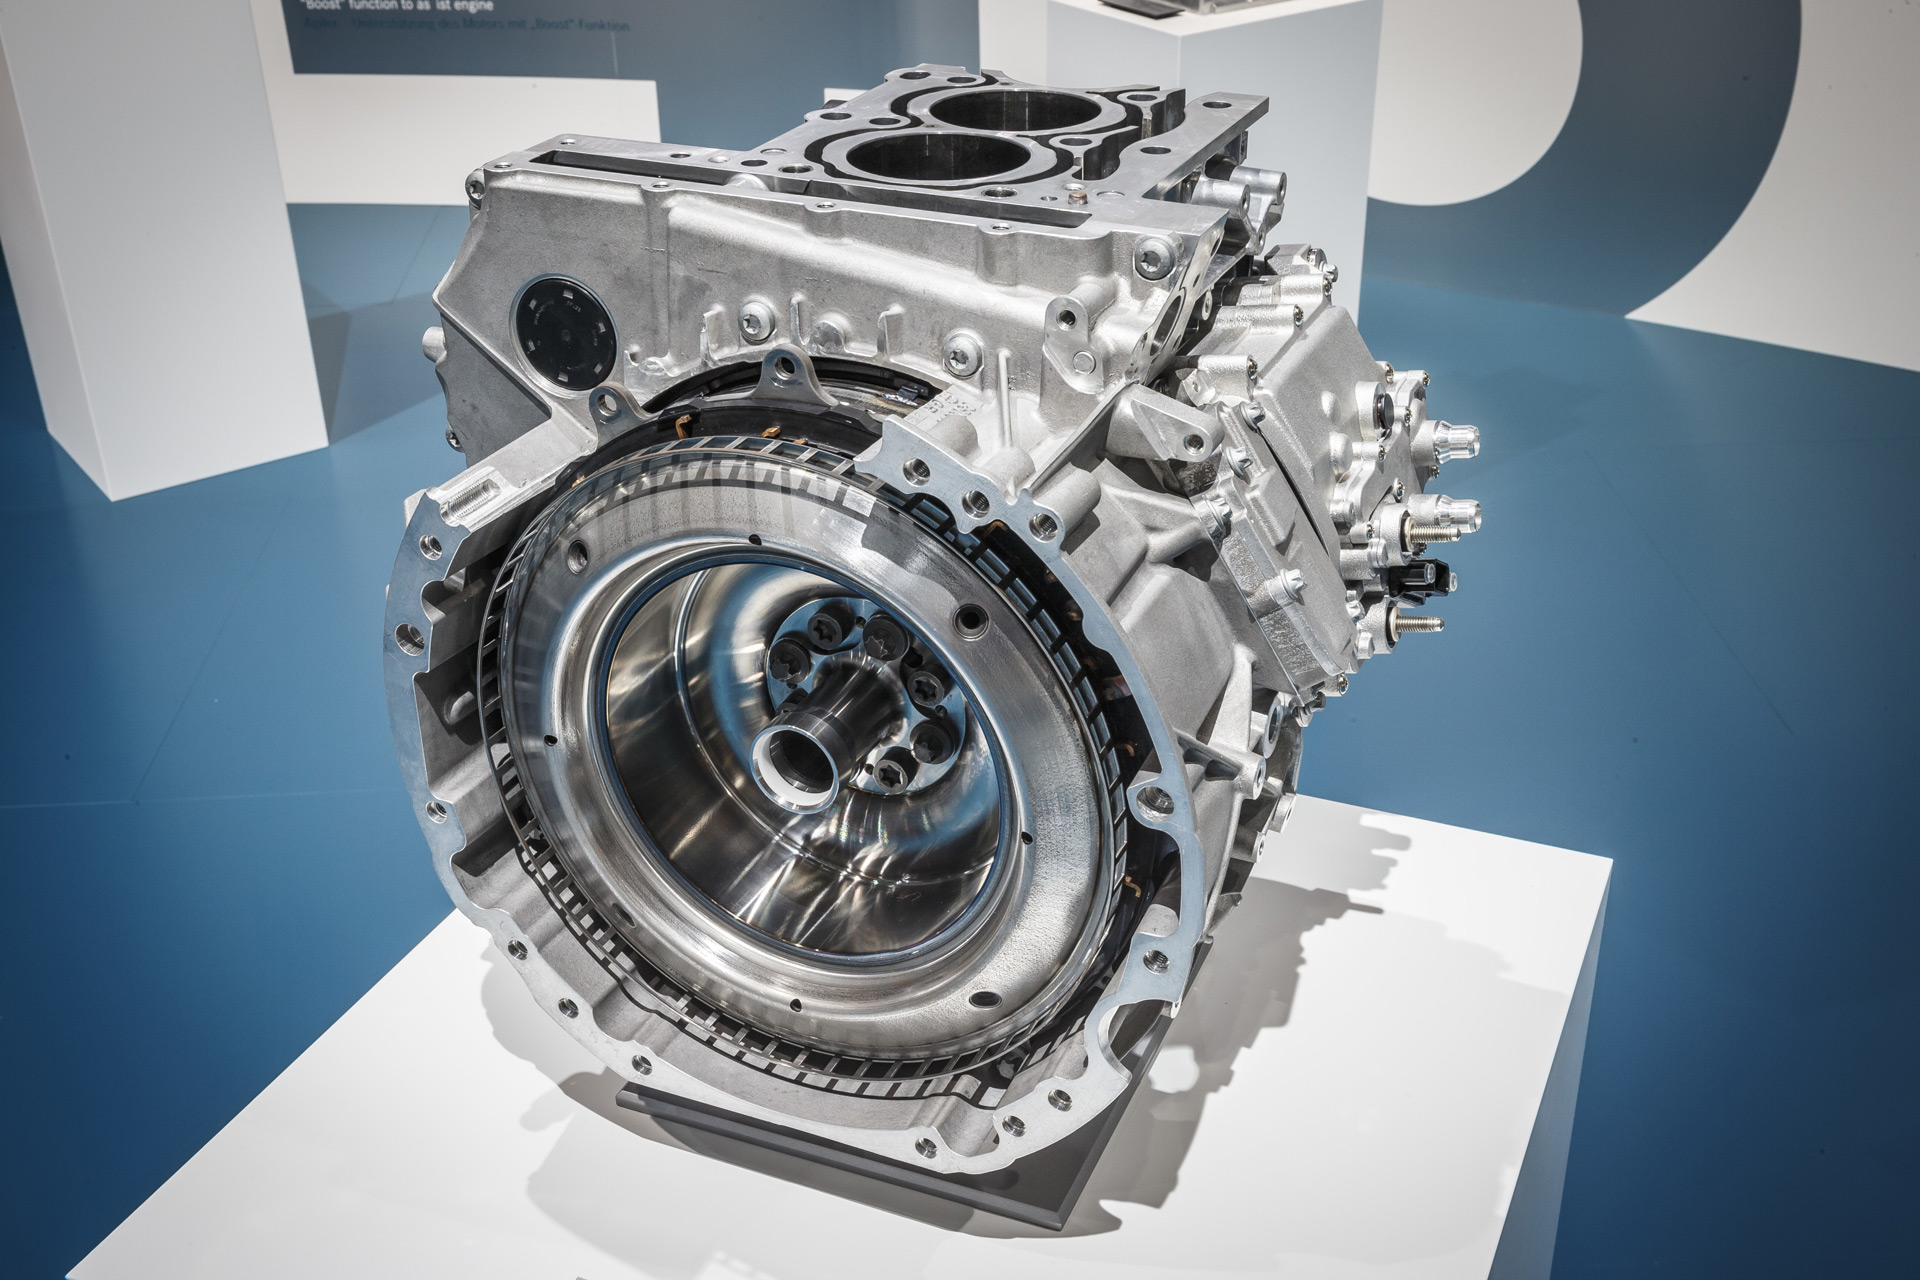 Mercedes Announces Inline 6 With 48 Volt Mild Hybrid System